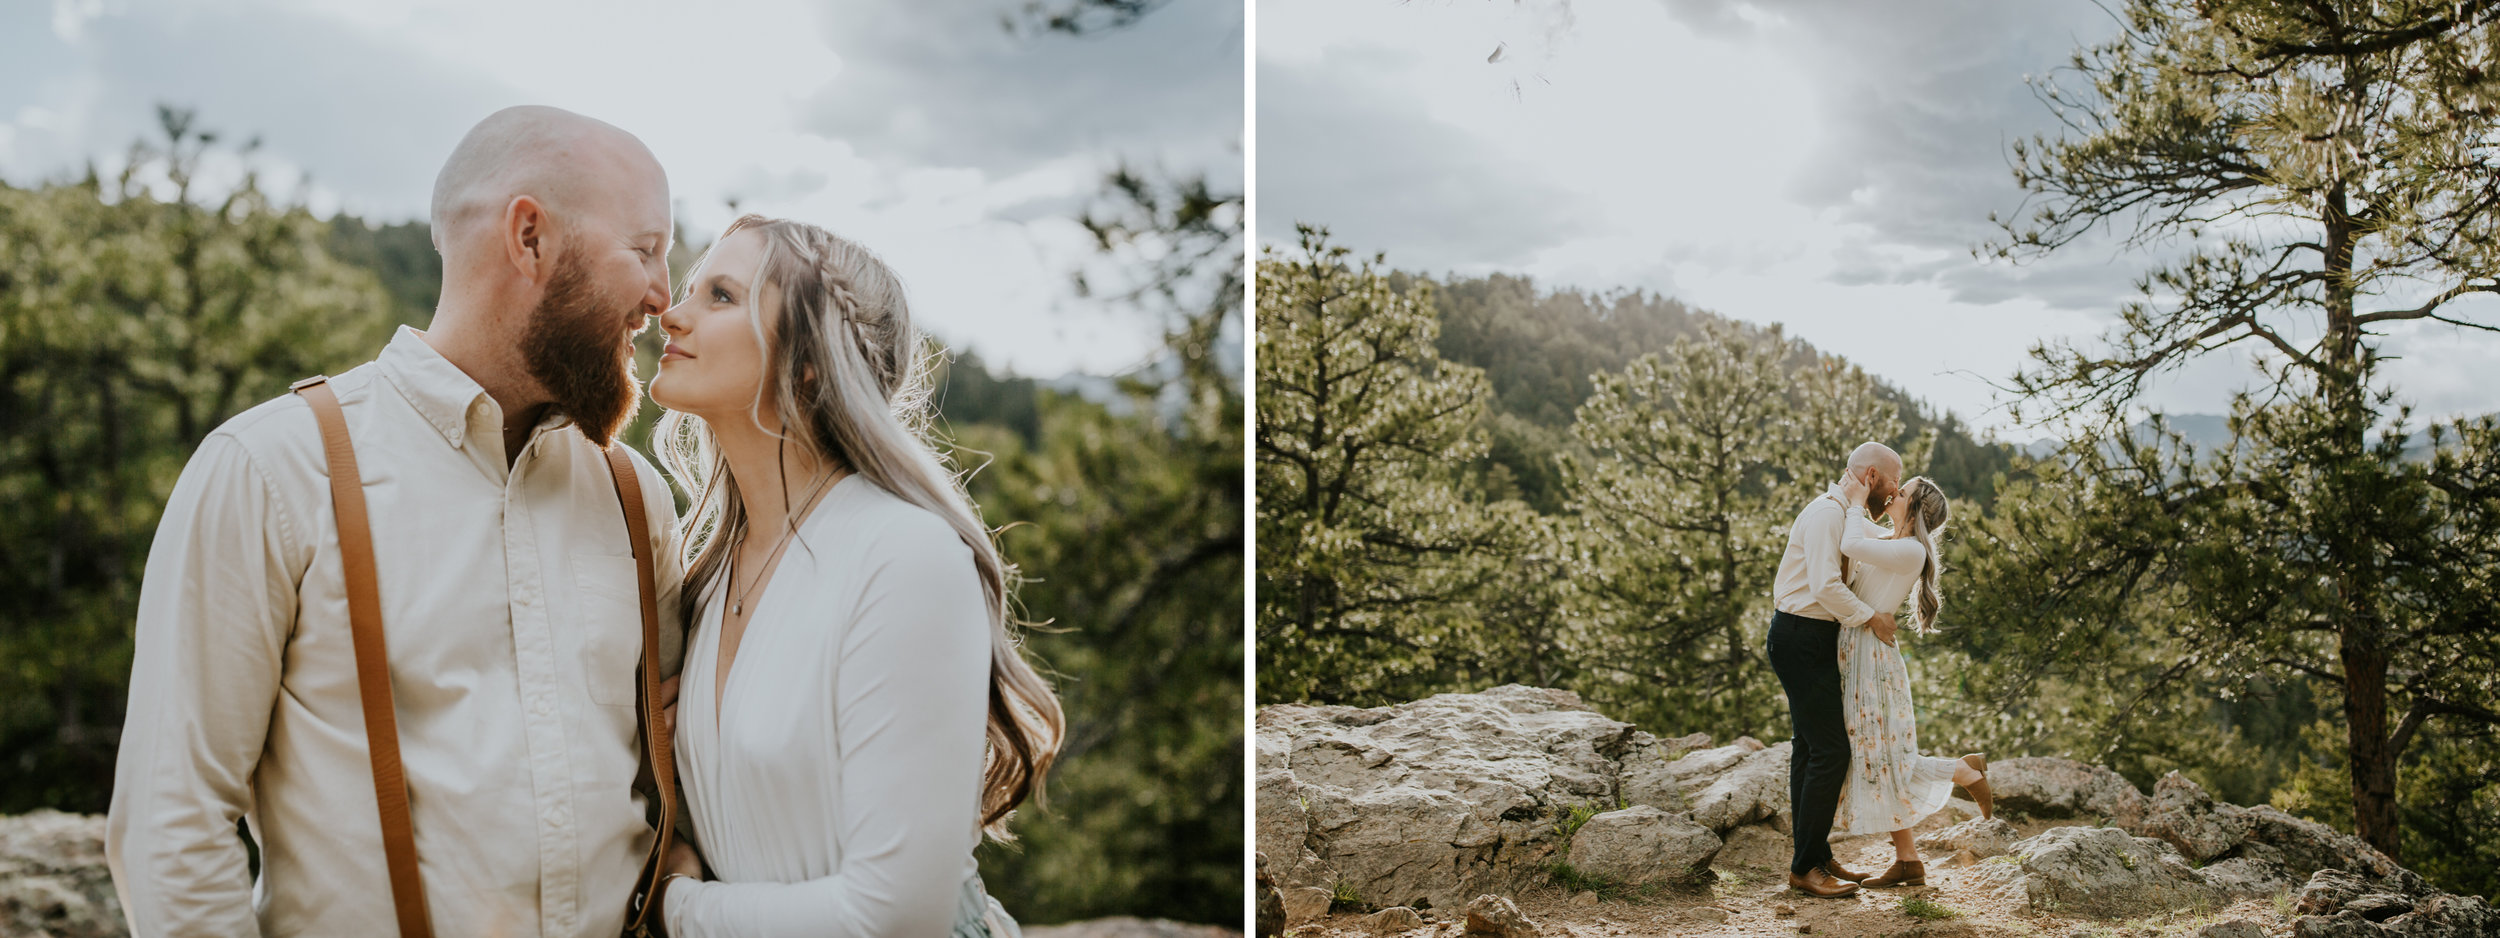 Lookout mountain engagement session denver colorado photographer 5.jpg